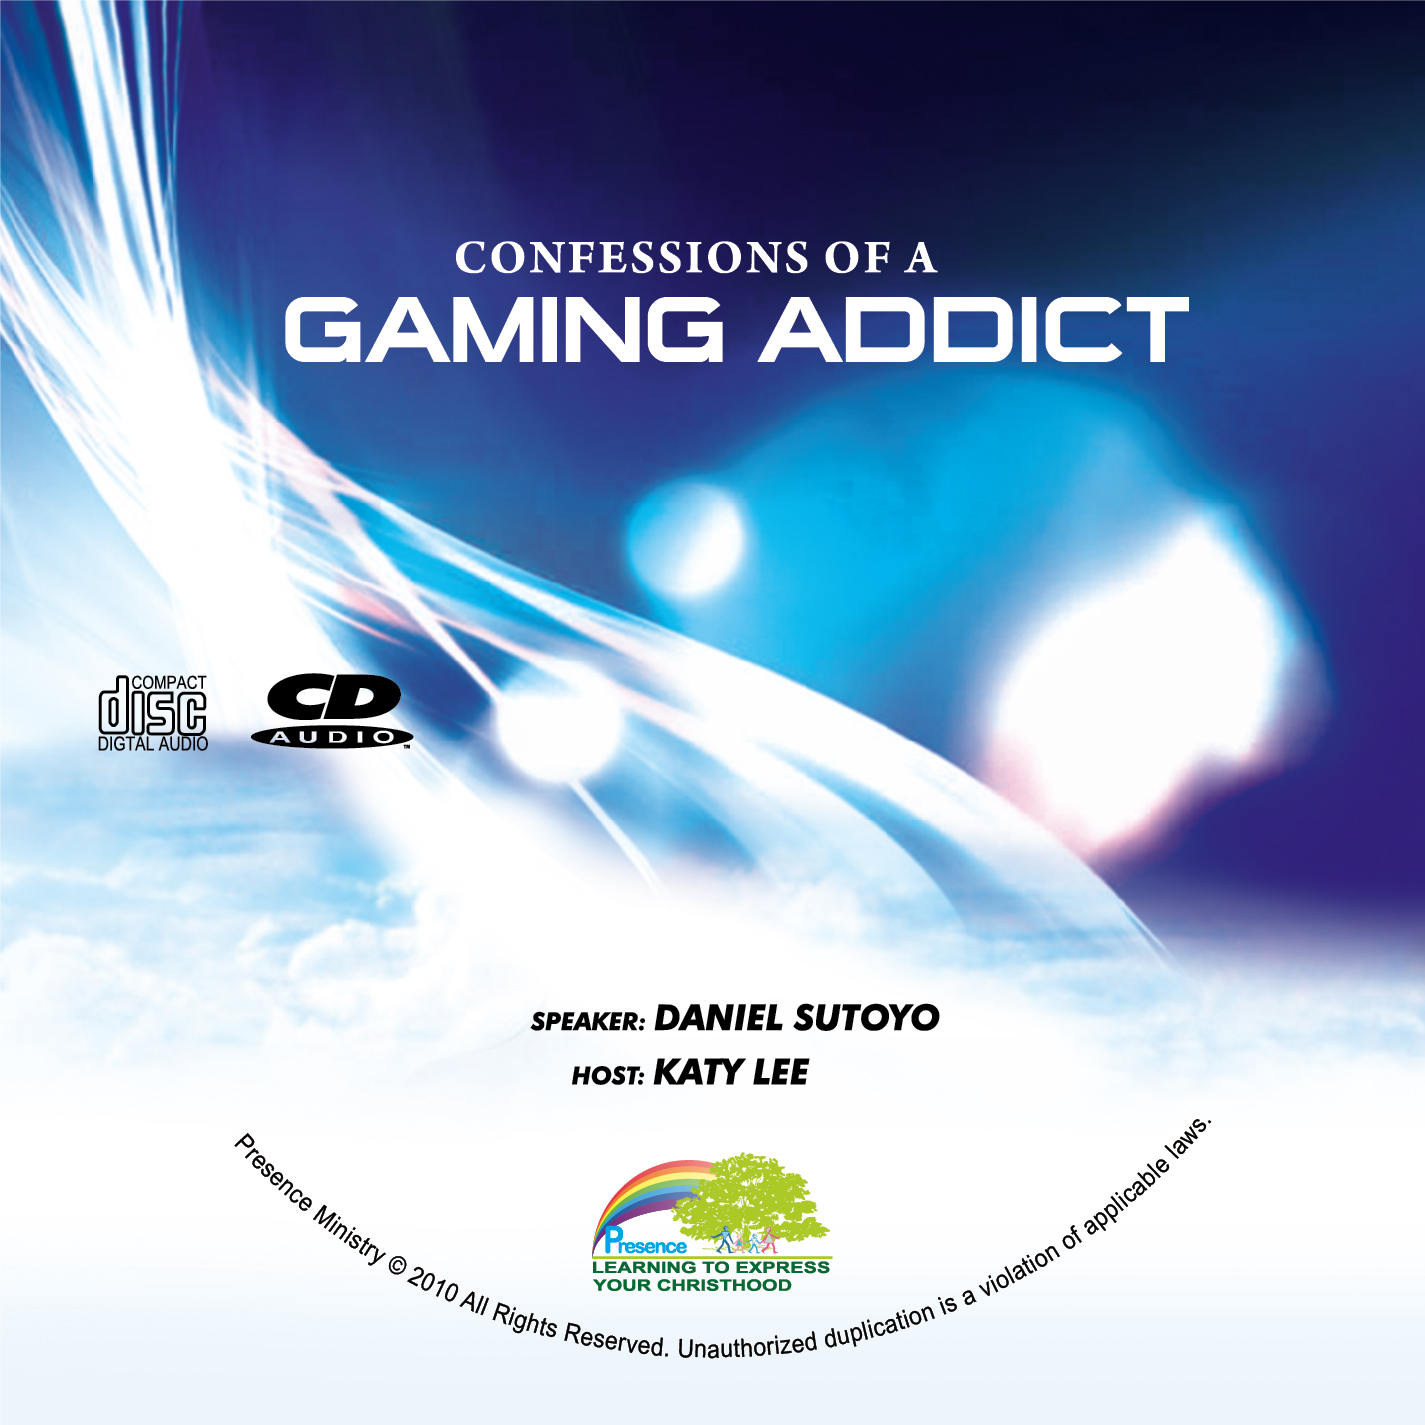 inc201_confessions_of_a_gaming_addict_cd_disc